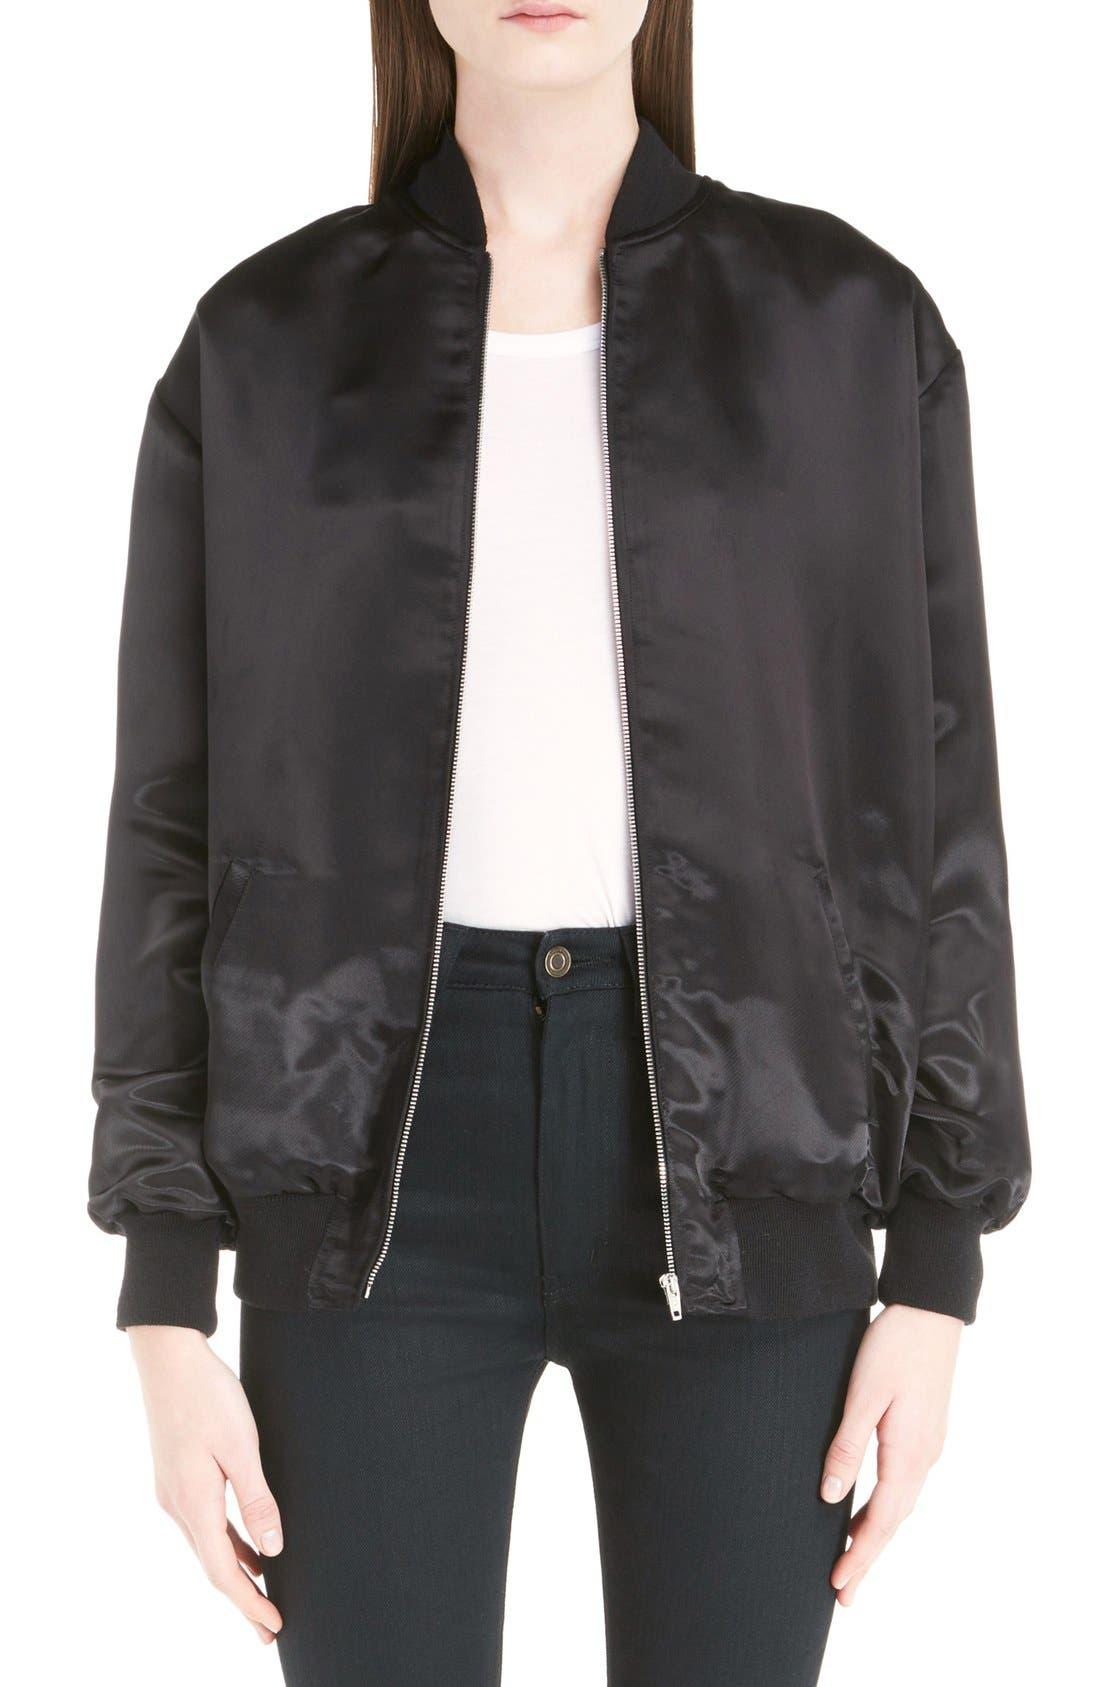 Alternate Image 1 Selected - Saint Laurent 'Teddy' Oversize Patch Satin Bomber Jacket